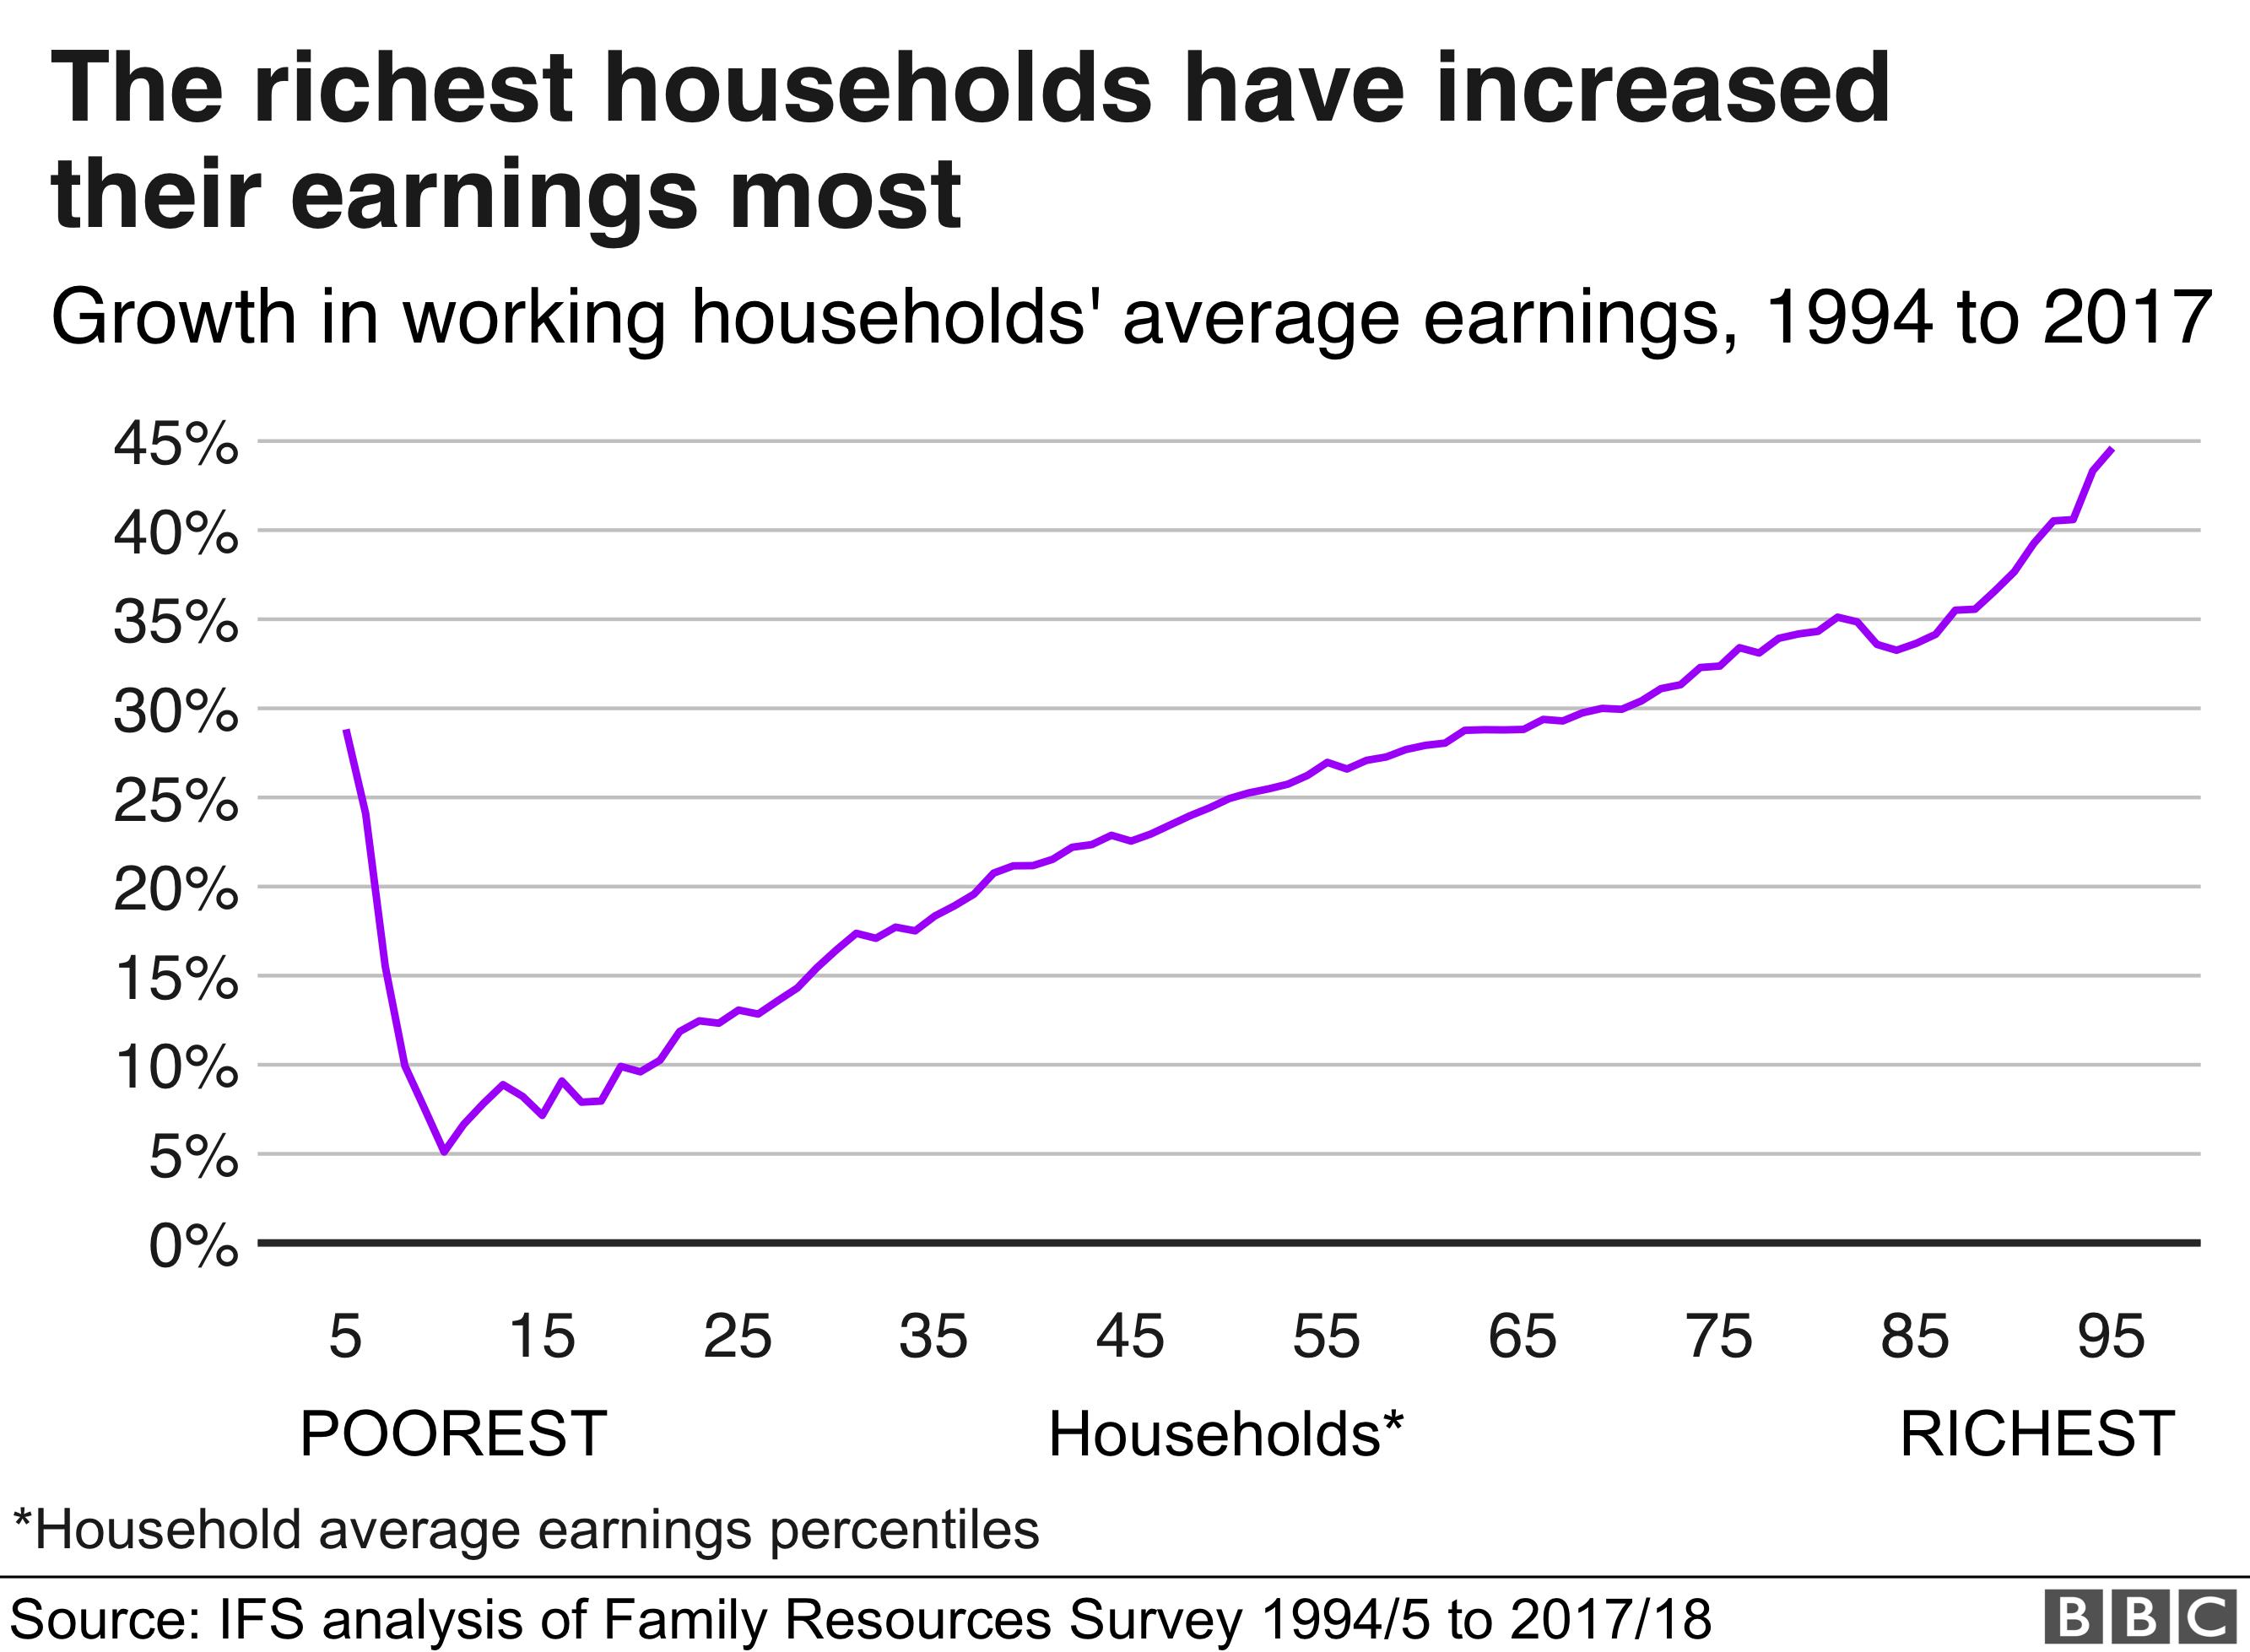 Richest increasing their earnings